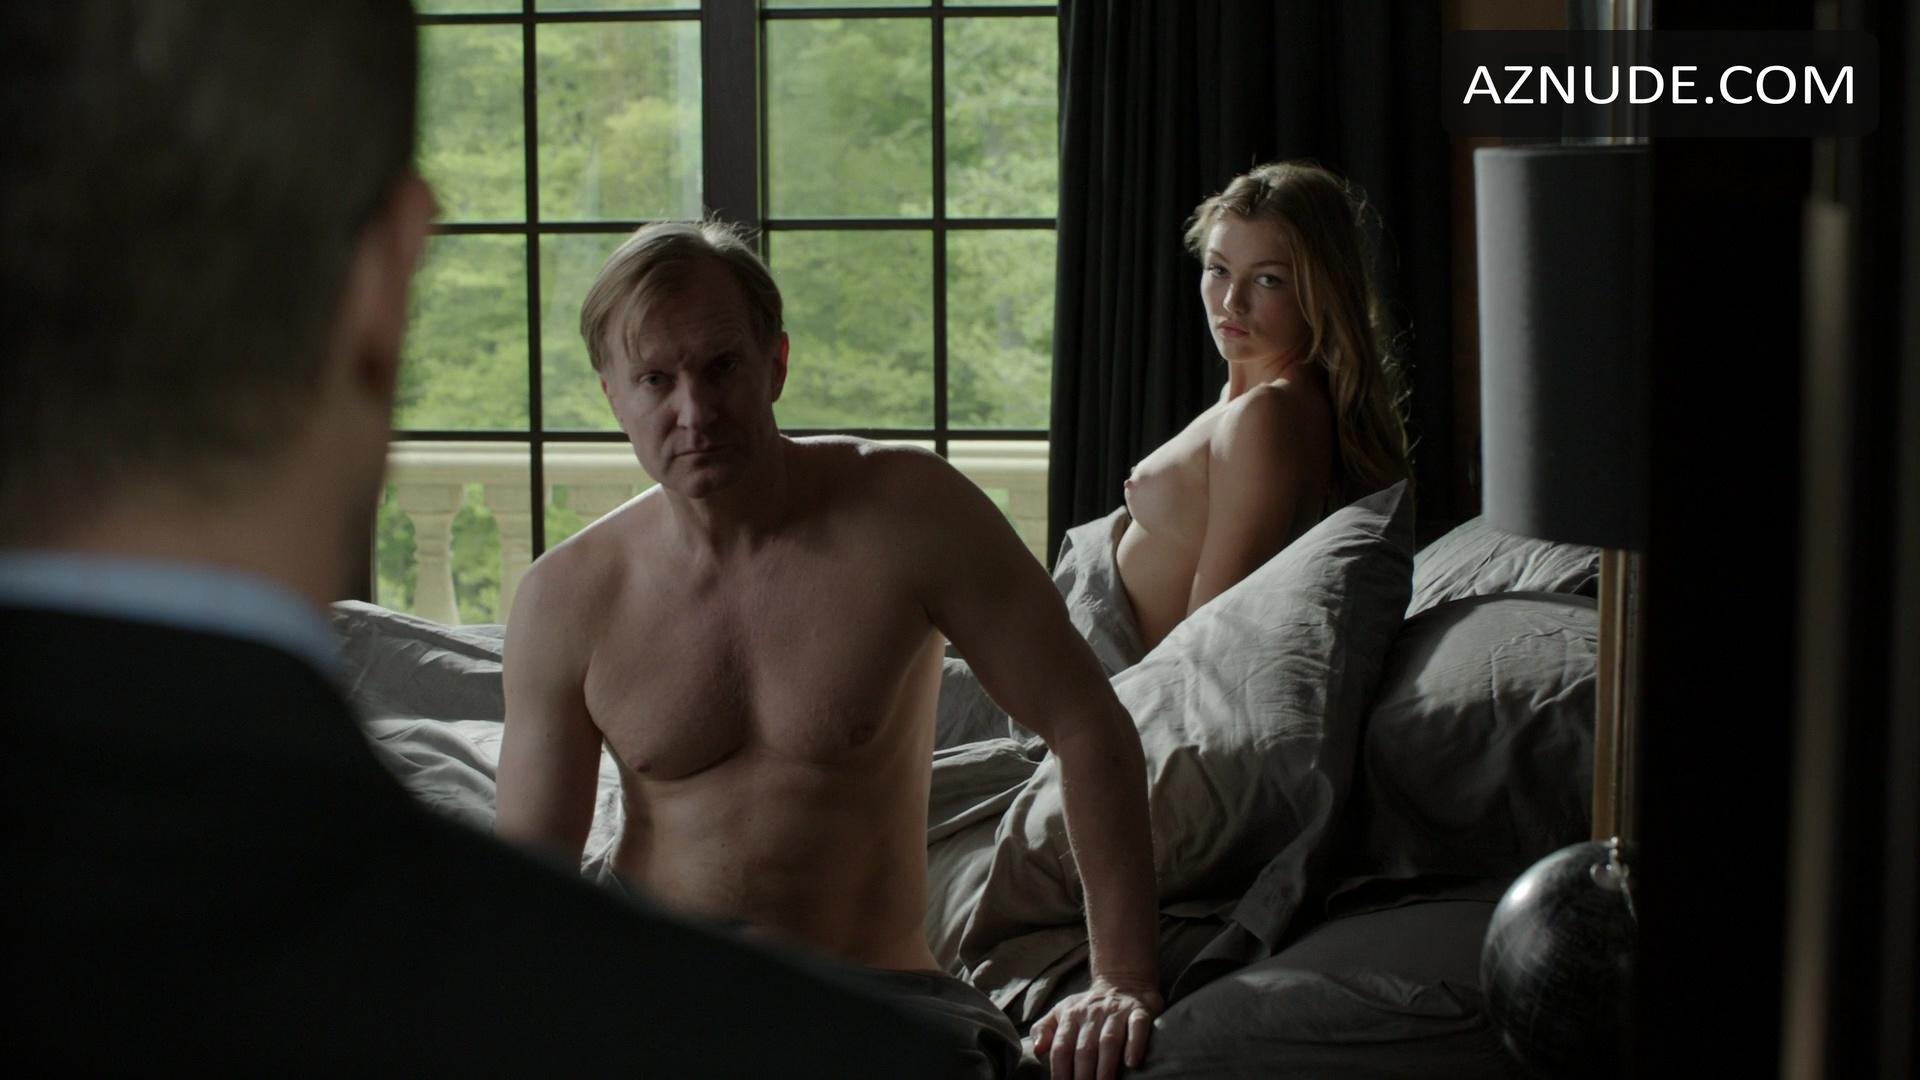 Banshee cast nude